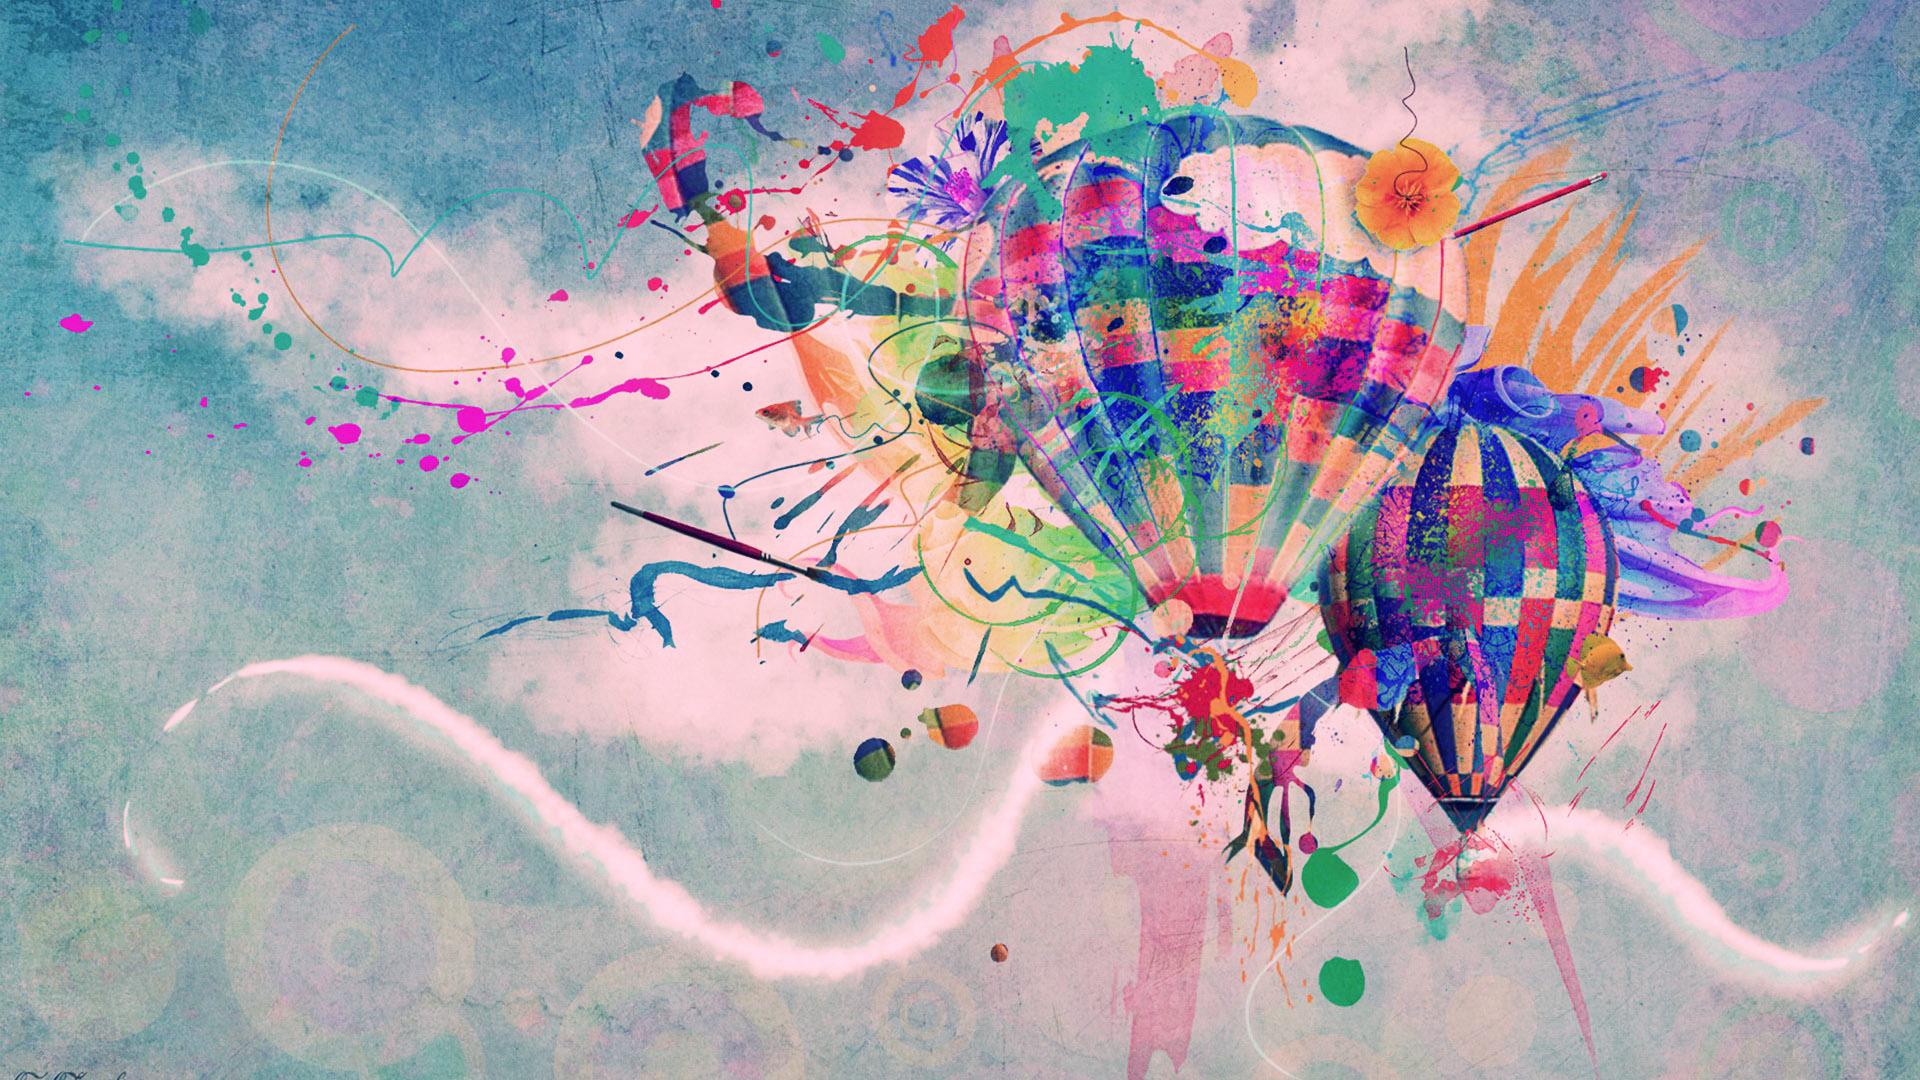 Abstract Hot Air Balloon Wallpaper